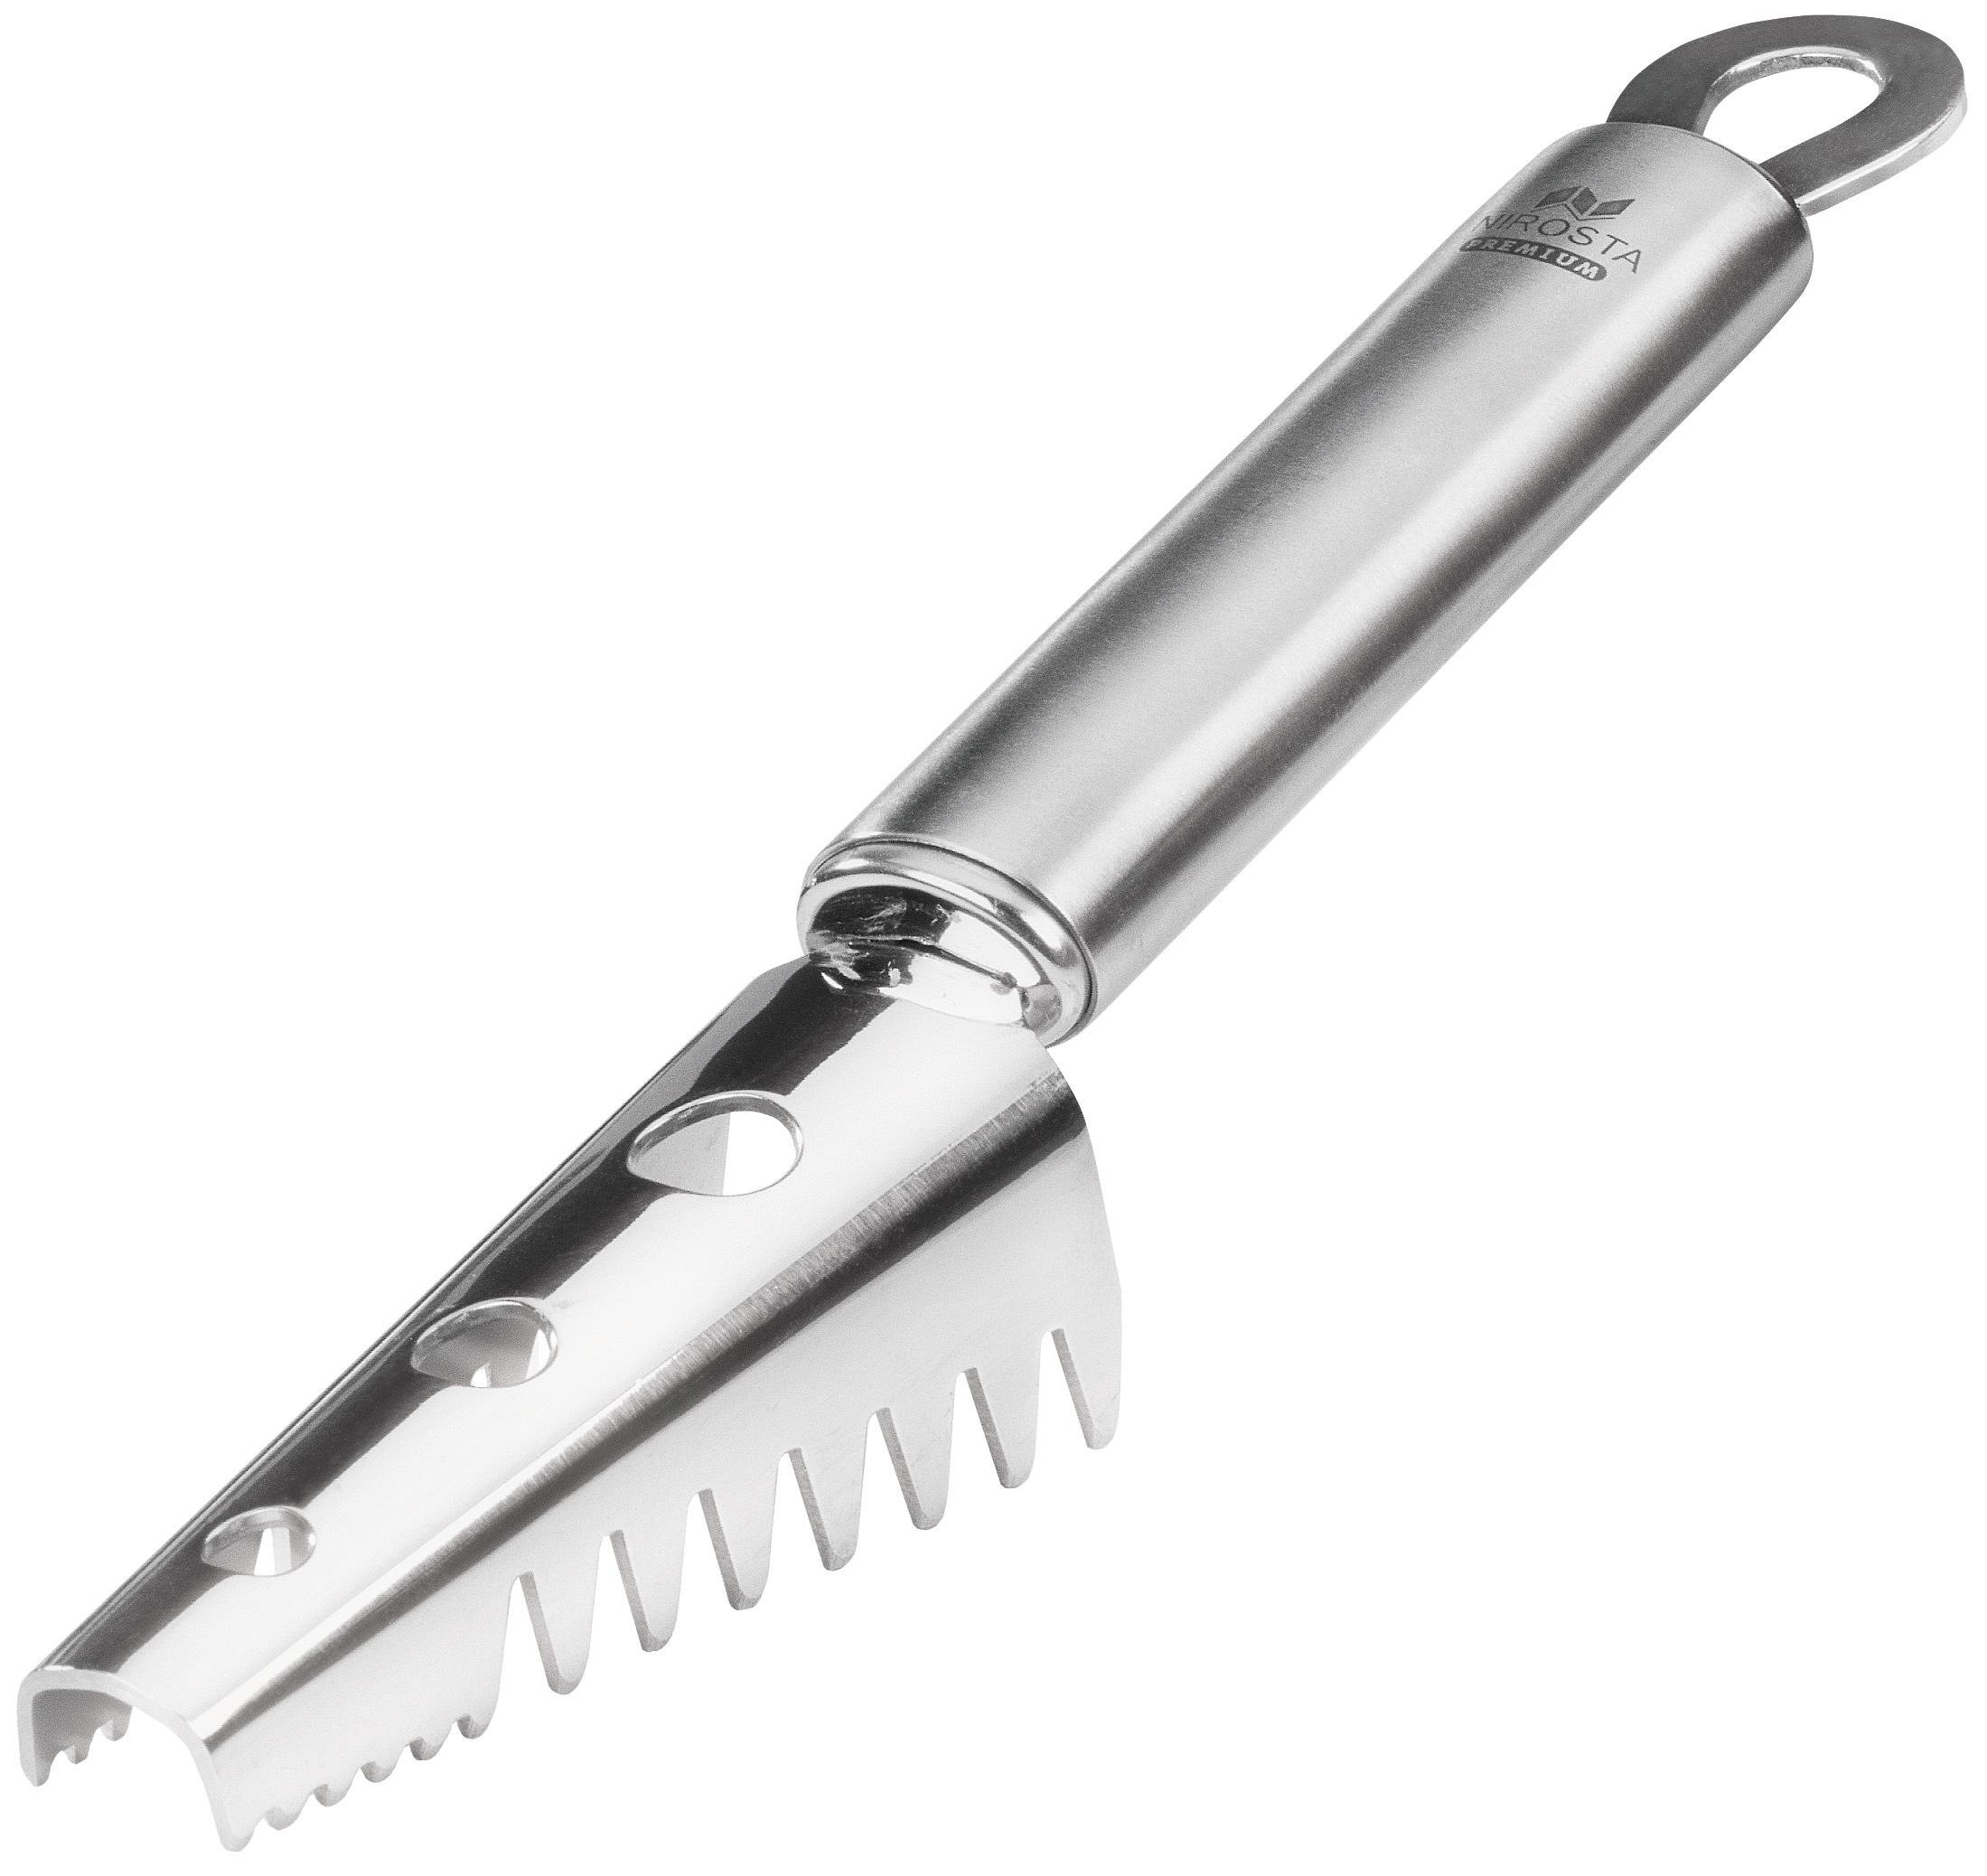 Нож для чистки рыбы FACKELMANN 20см NIROSTA фото